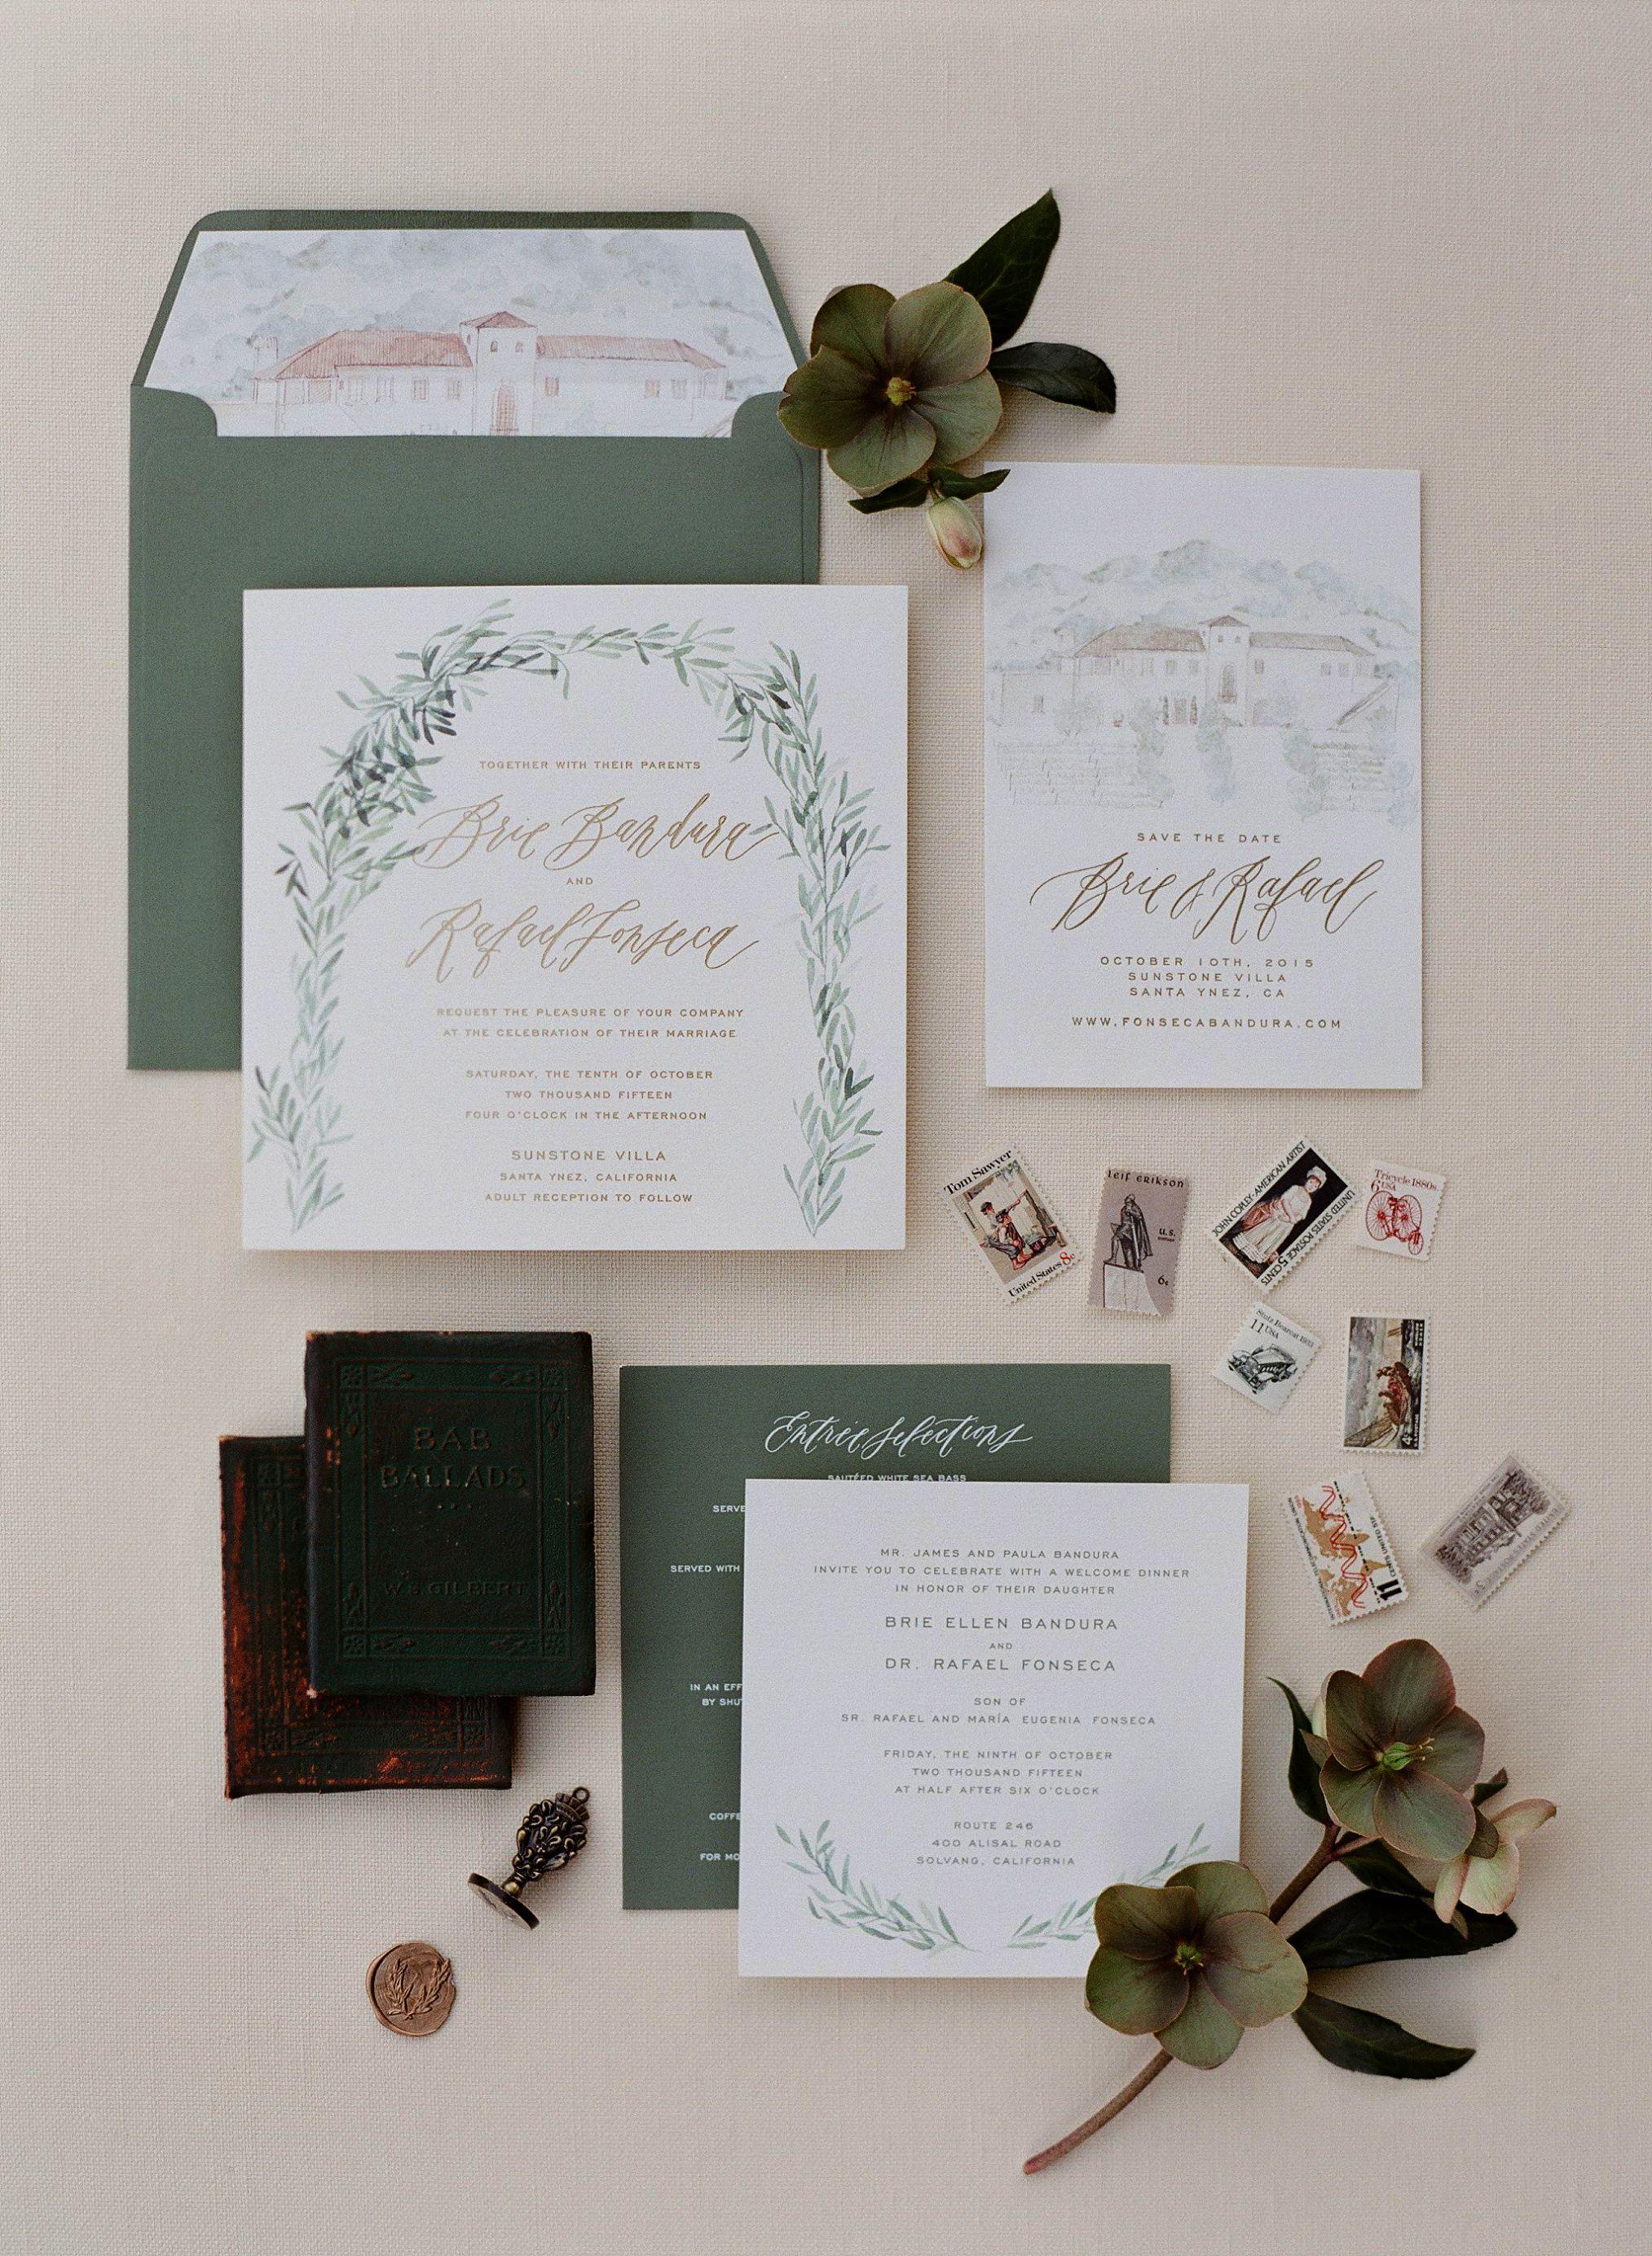 50 Pcs Exquisite Carving Wedding Invitation Kits With Silk Ribbon Purple Calligraphy Wedding Invitation Wedding Invitation Inspiration Olive Green Weddings